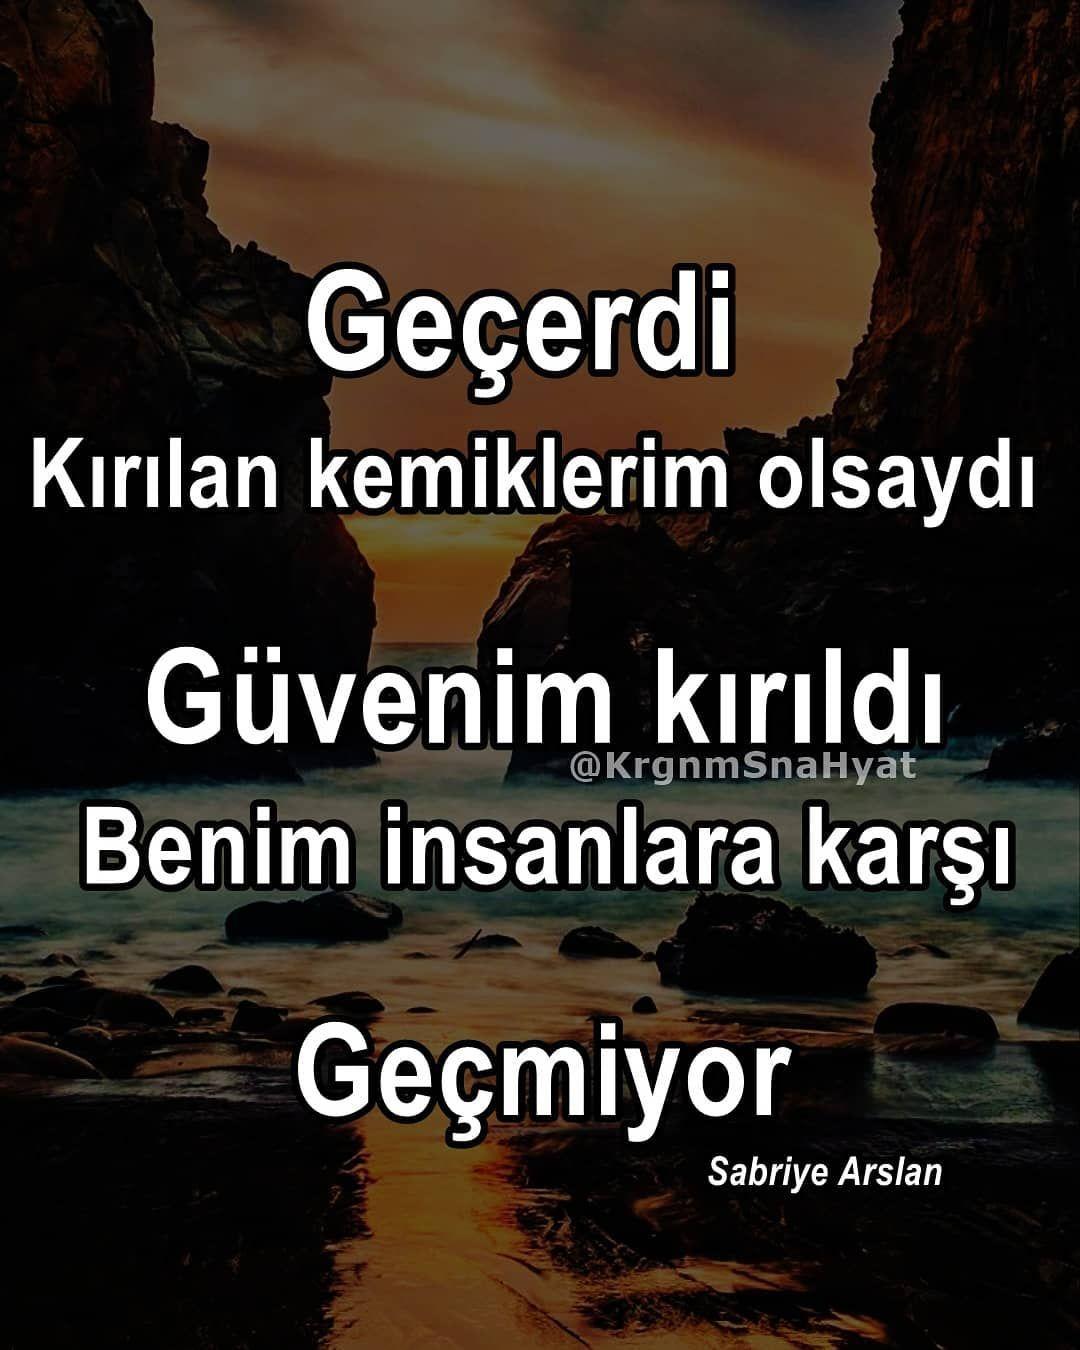 Gefallt 1 542 Mal 25 Kommentare Sabriye Arslan Sabriyearslanofficial Auf Instagram 5 Tane Gt Yazarak Takip Sayinizi Artirab In 2020 Tolle Worte Zitate Worter